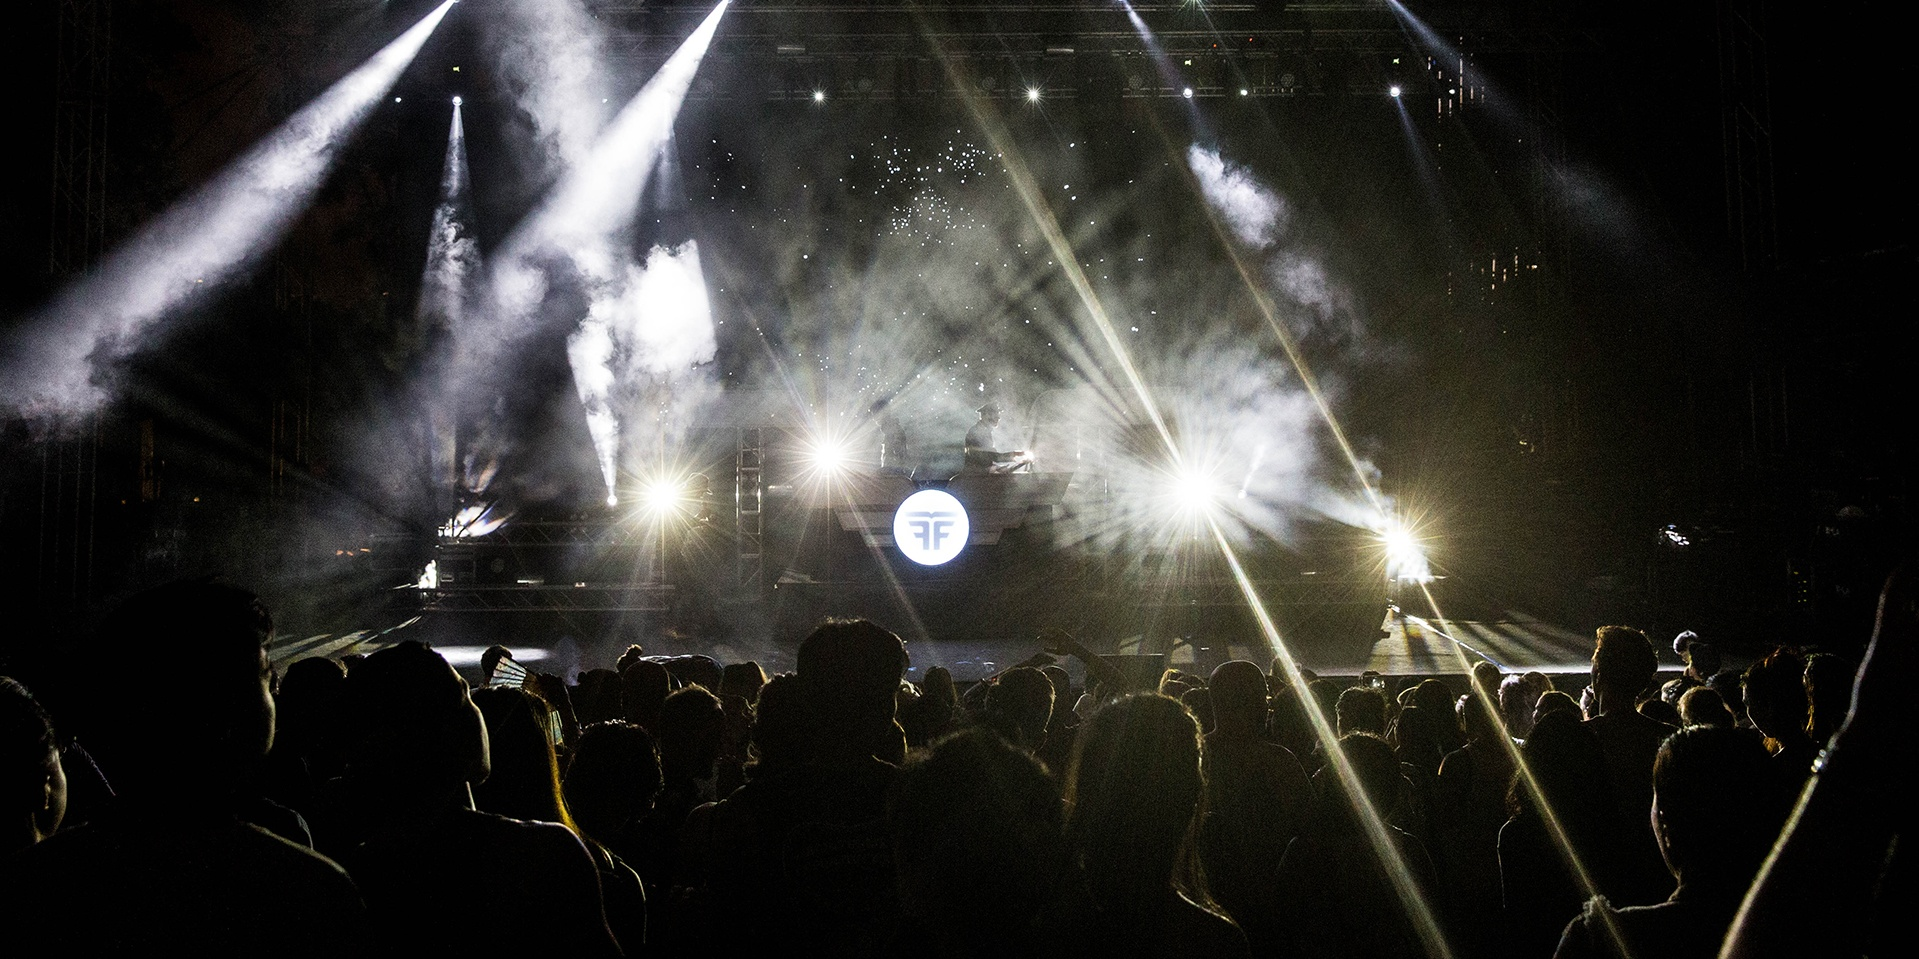 PHOTO GALLERY: Neon Lights Festival 2015